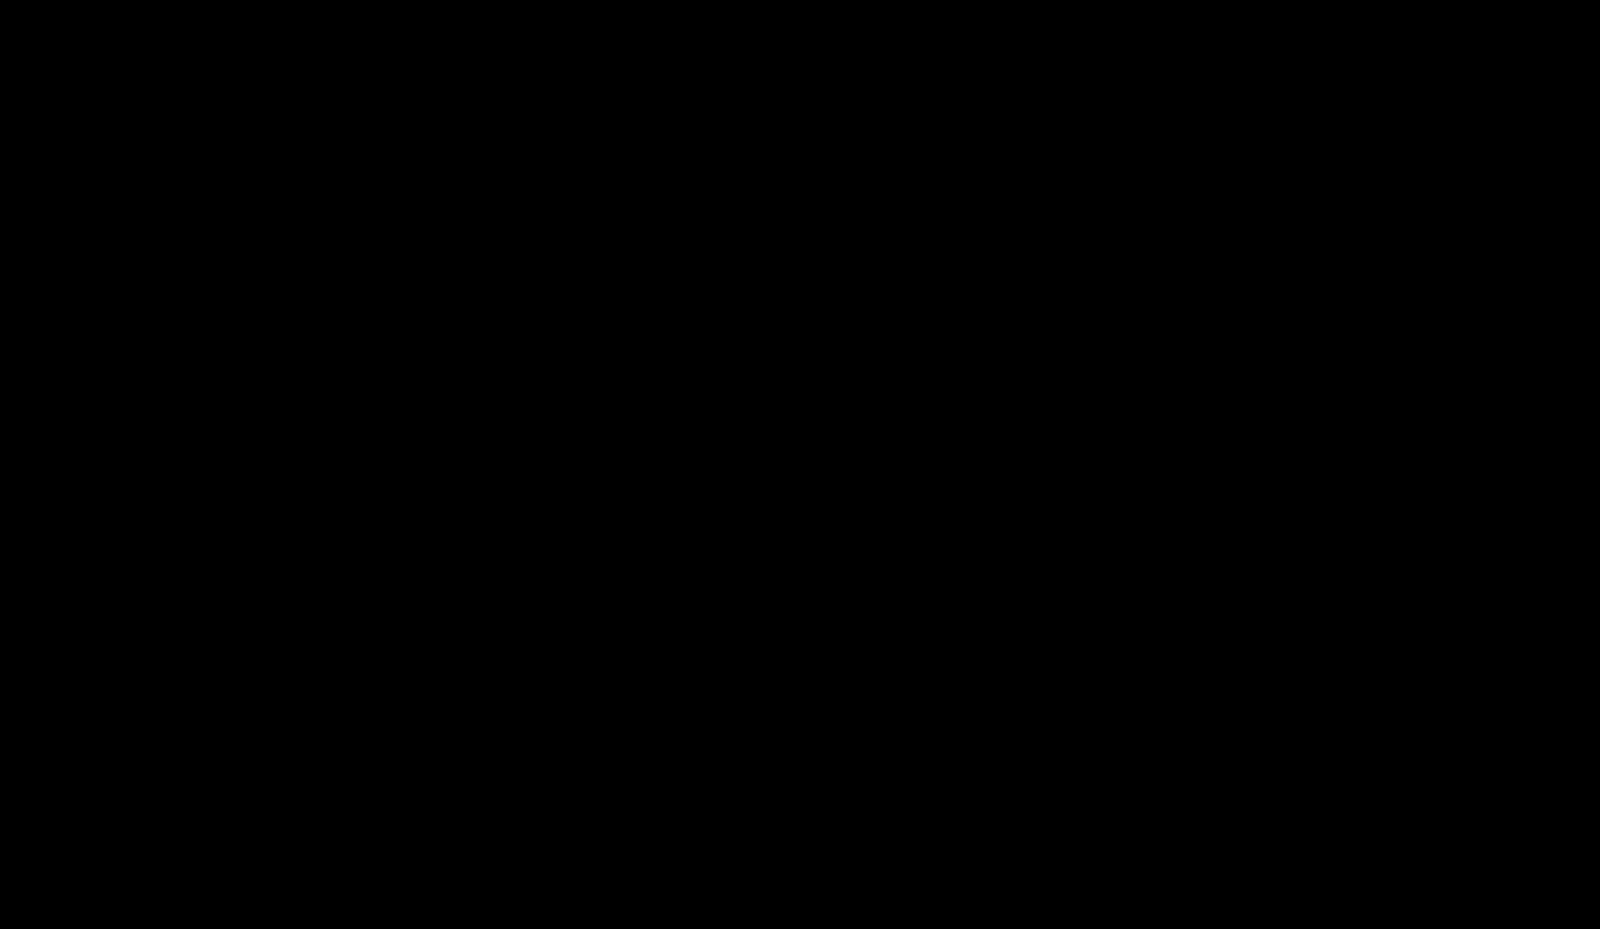 Plane SVG Clip arts